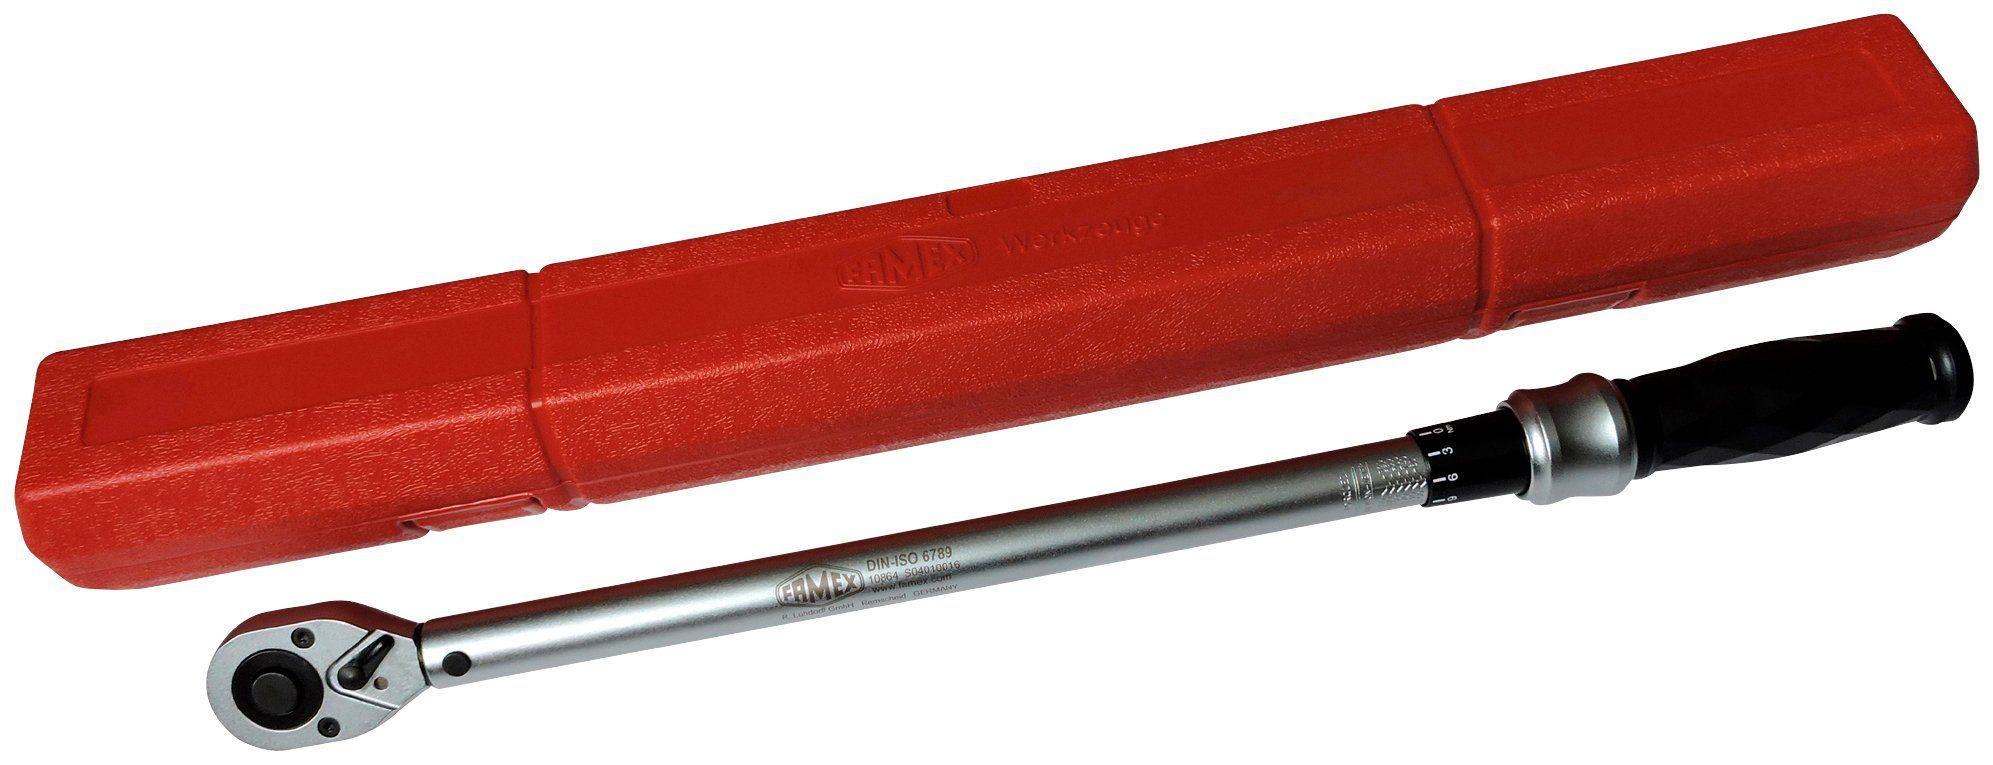 FAMEX Drehmomentschlüssel »Pro R+L«, 50-350 Nm